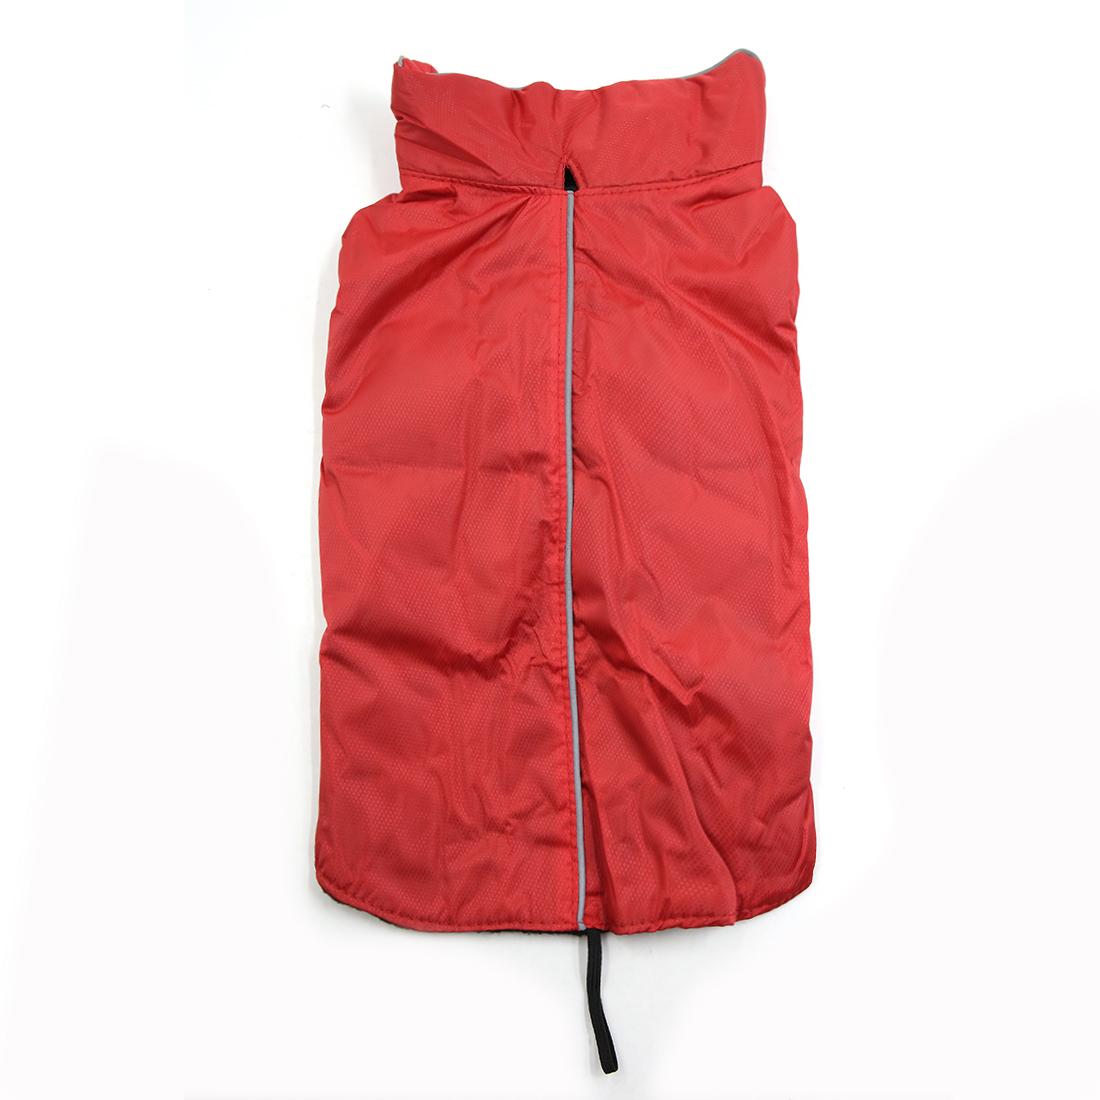 Reflective Vest Jacket Clothes Soft Warm Fleece Lining Dog Coat Clothing Red M